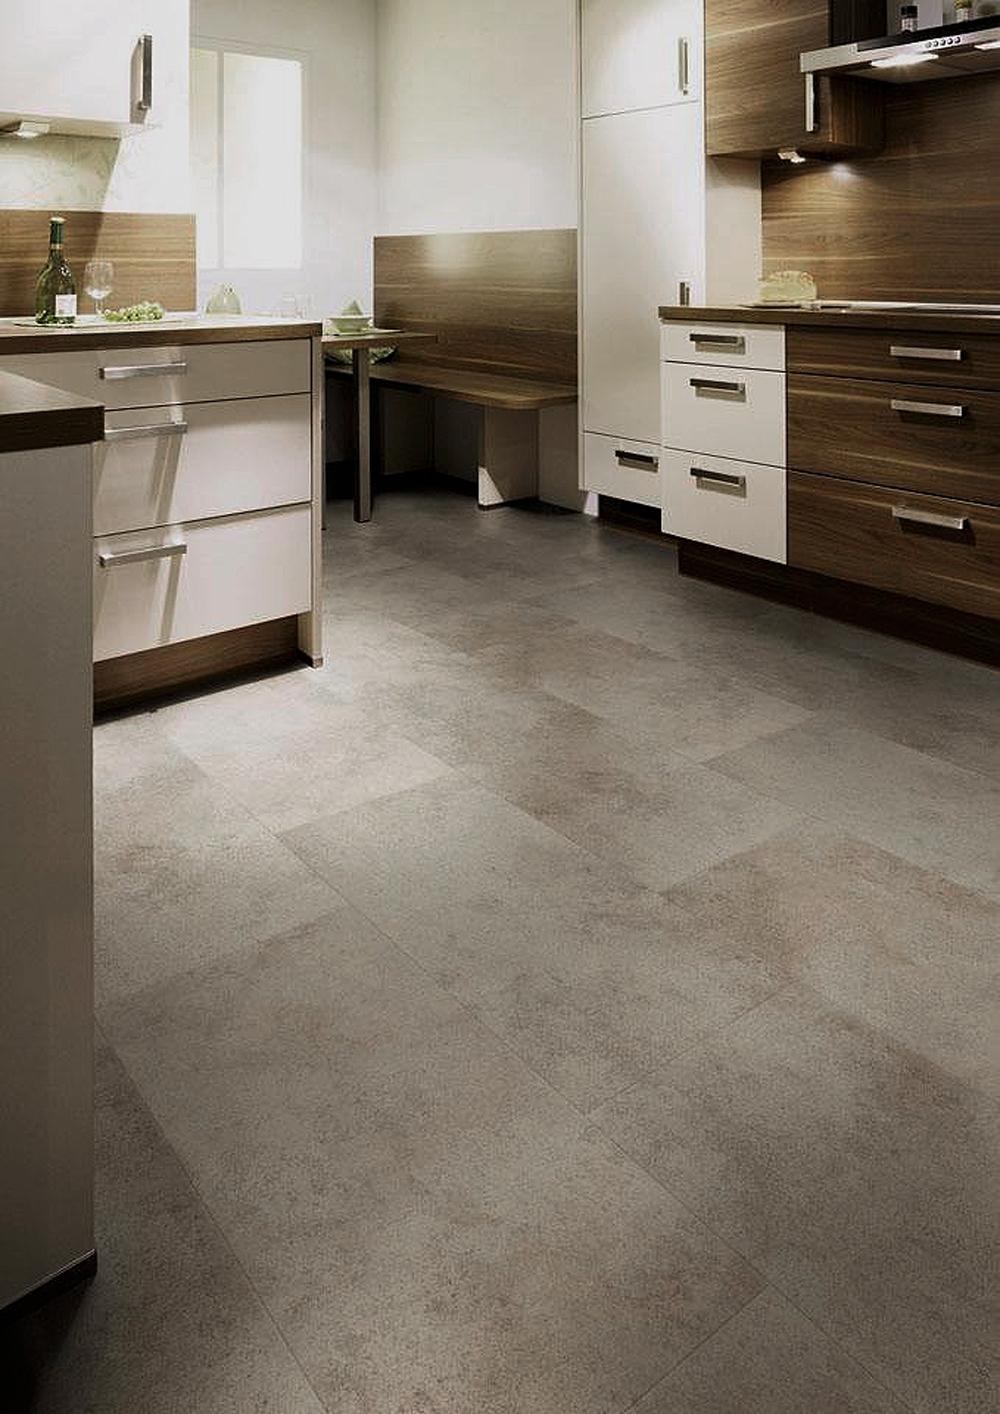 PVC vloer in betonlook in langwerpige tegels in de keuken.